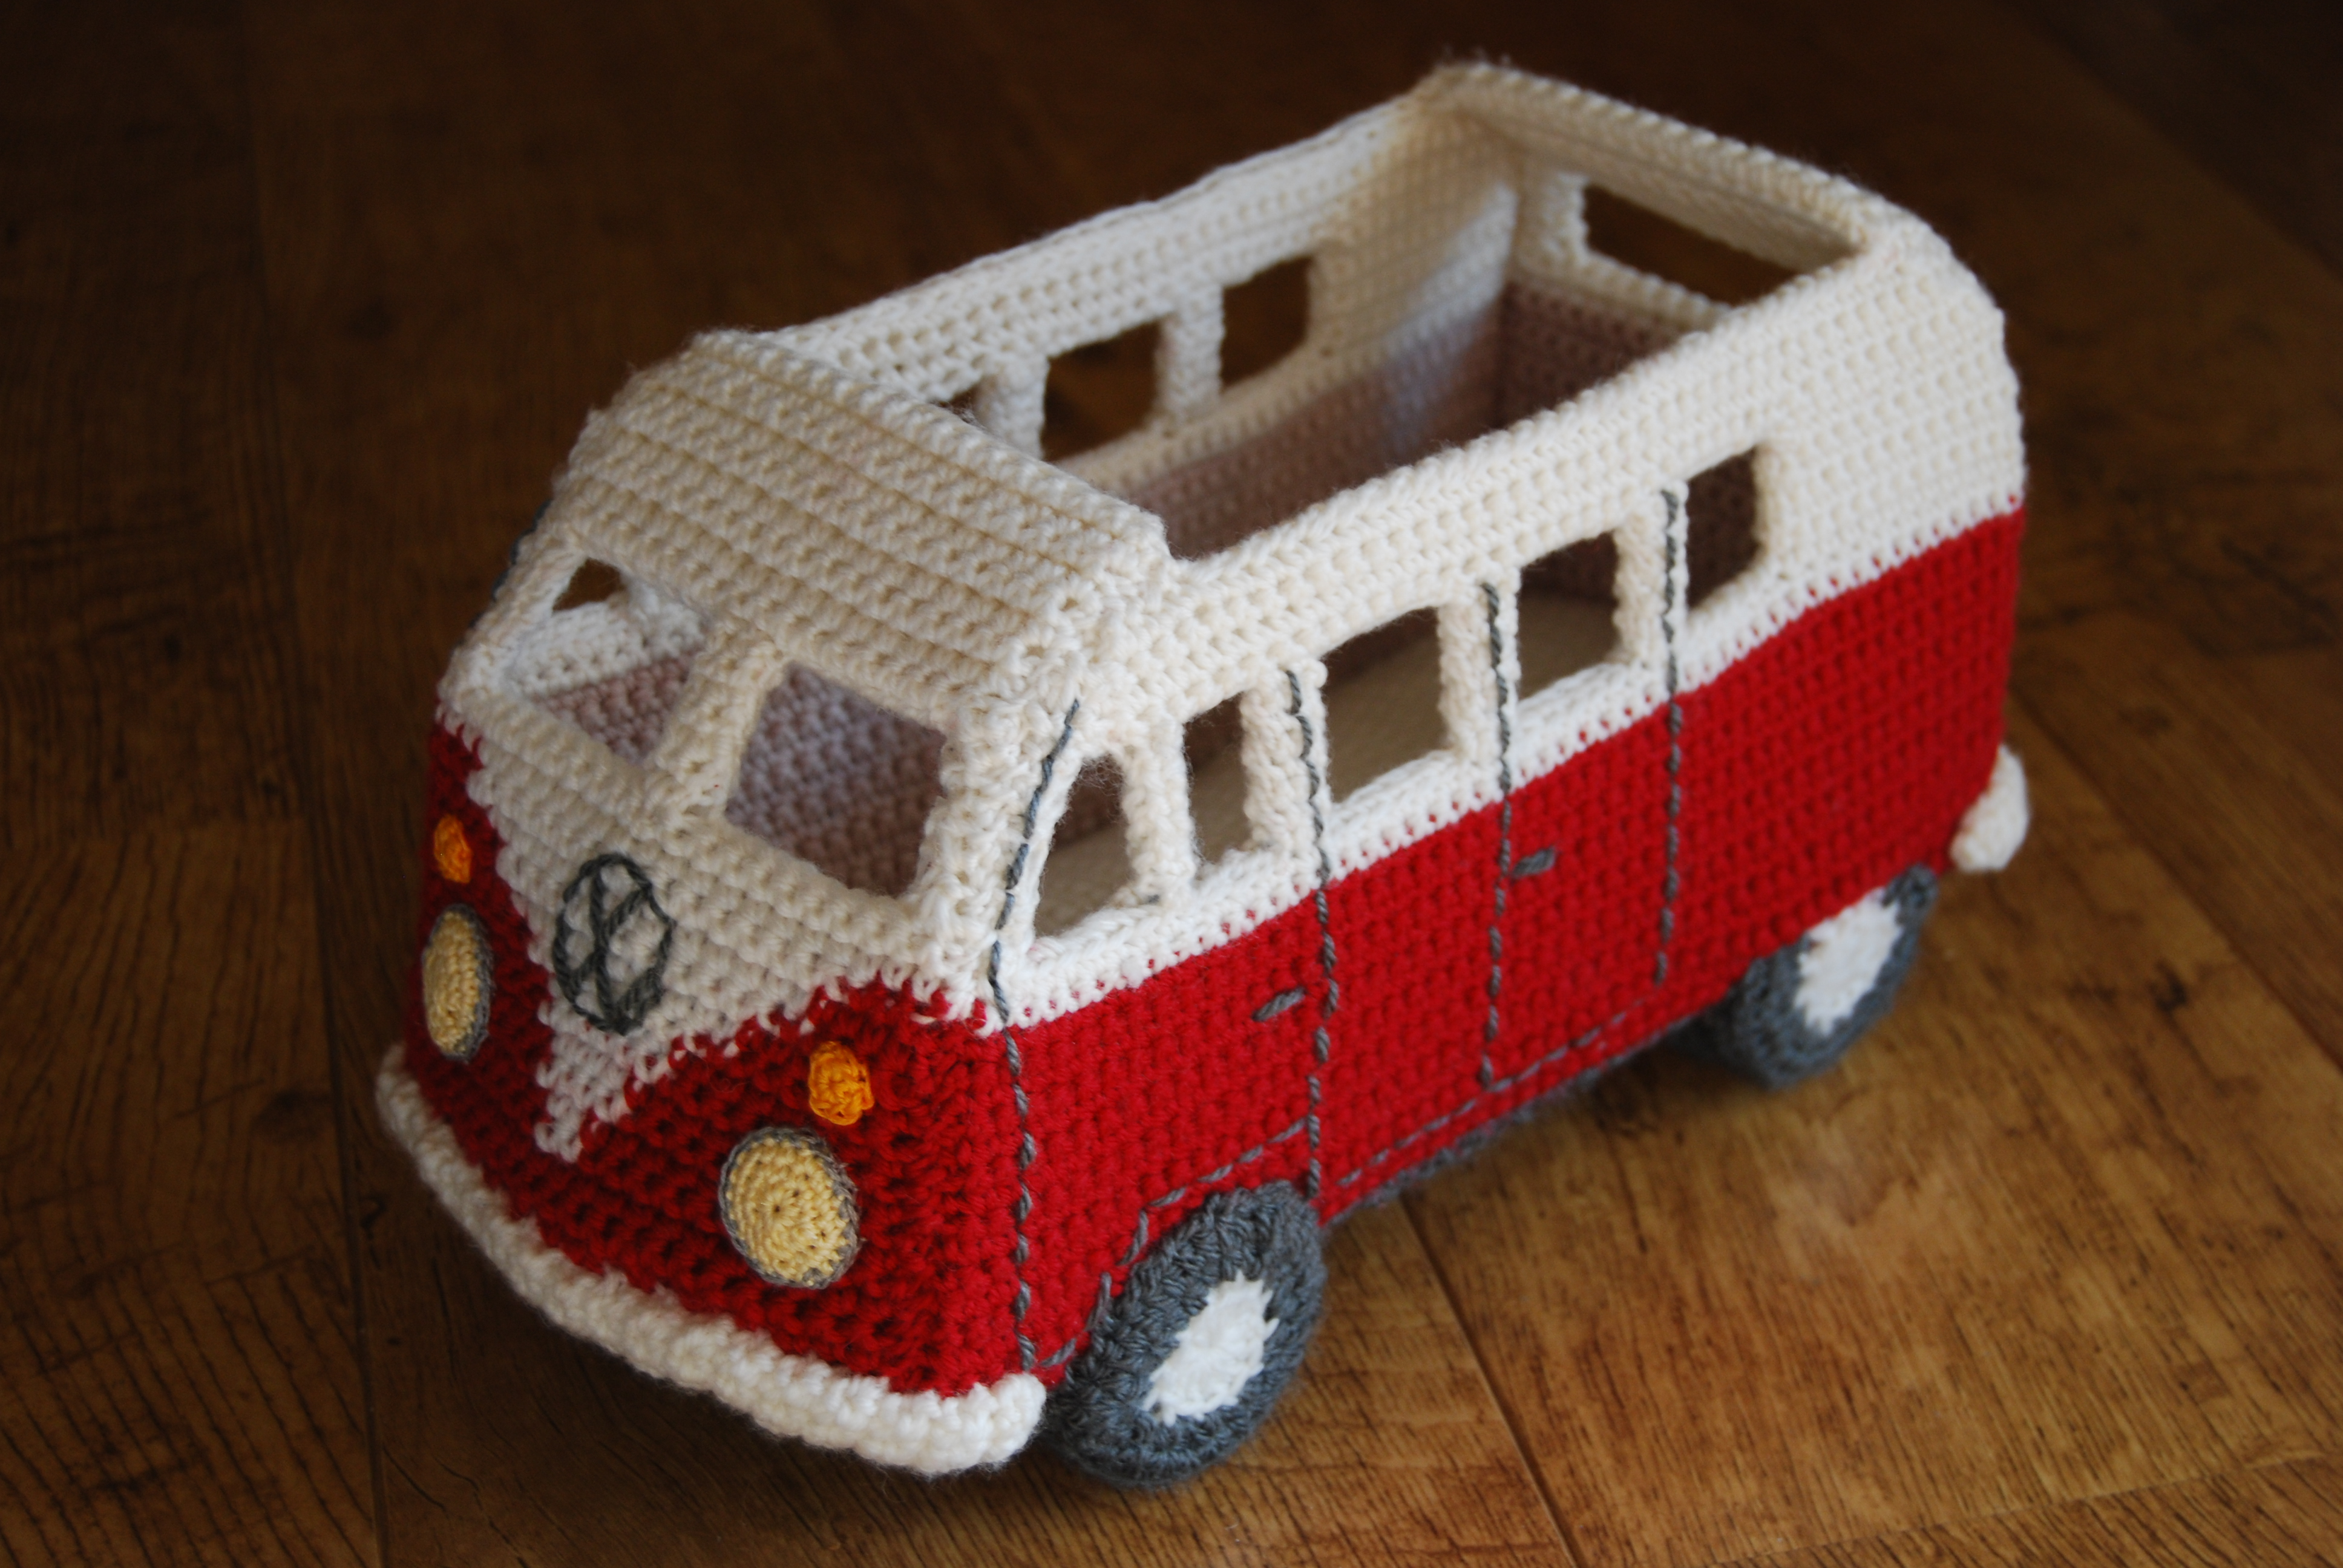 Splitty campervan pdf crochet pattern slightly sheepish splitty campervan pdf crochet pattern bankloansurffo Gallery